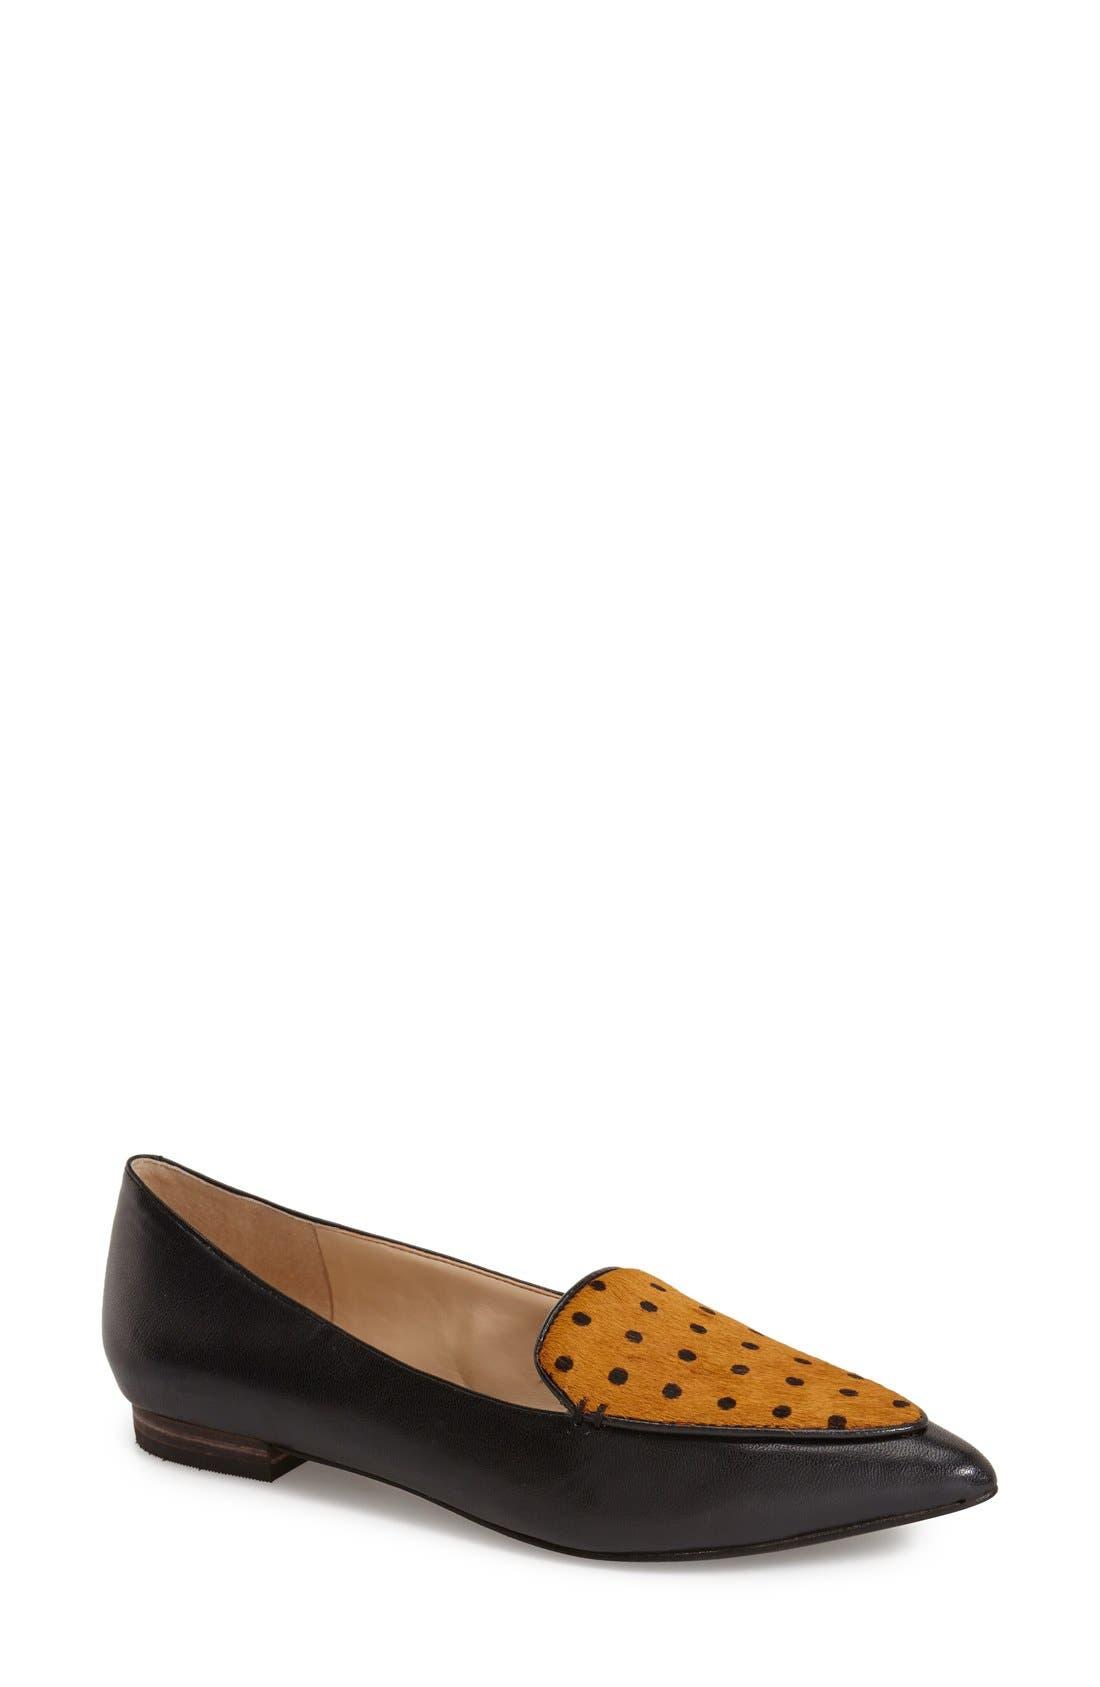 Main Image - Sole Society 'Cammila' Pointy Toe Loafer (Women)